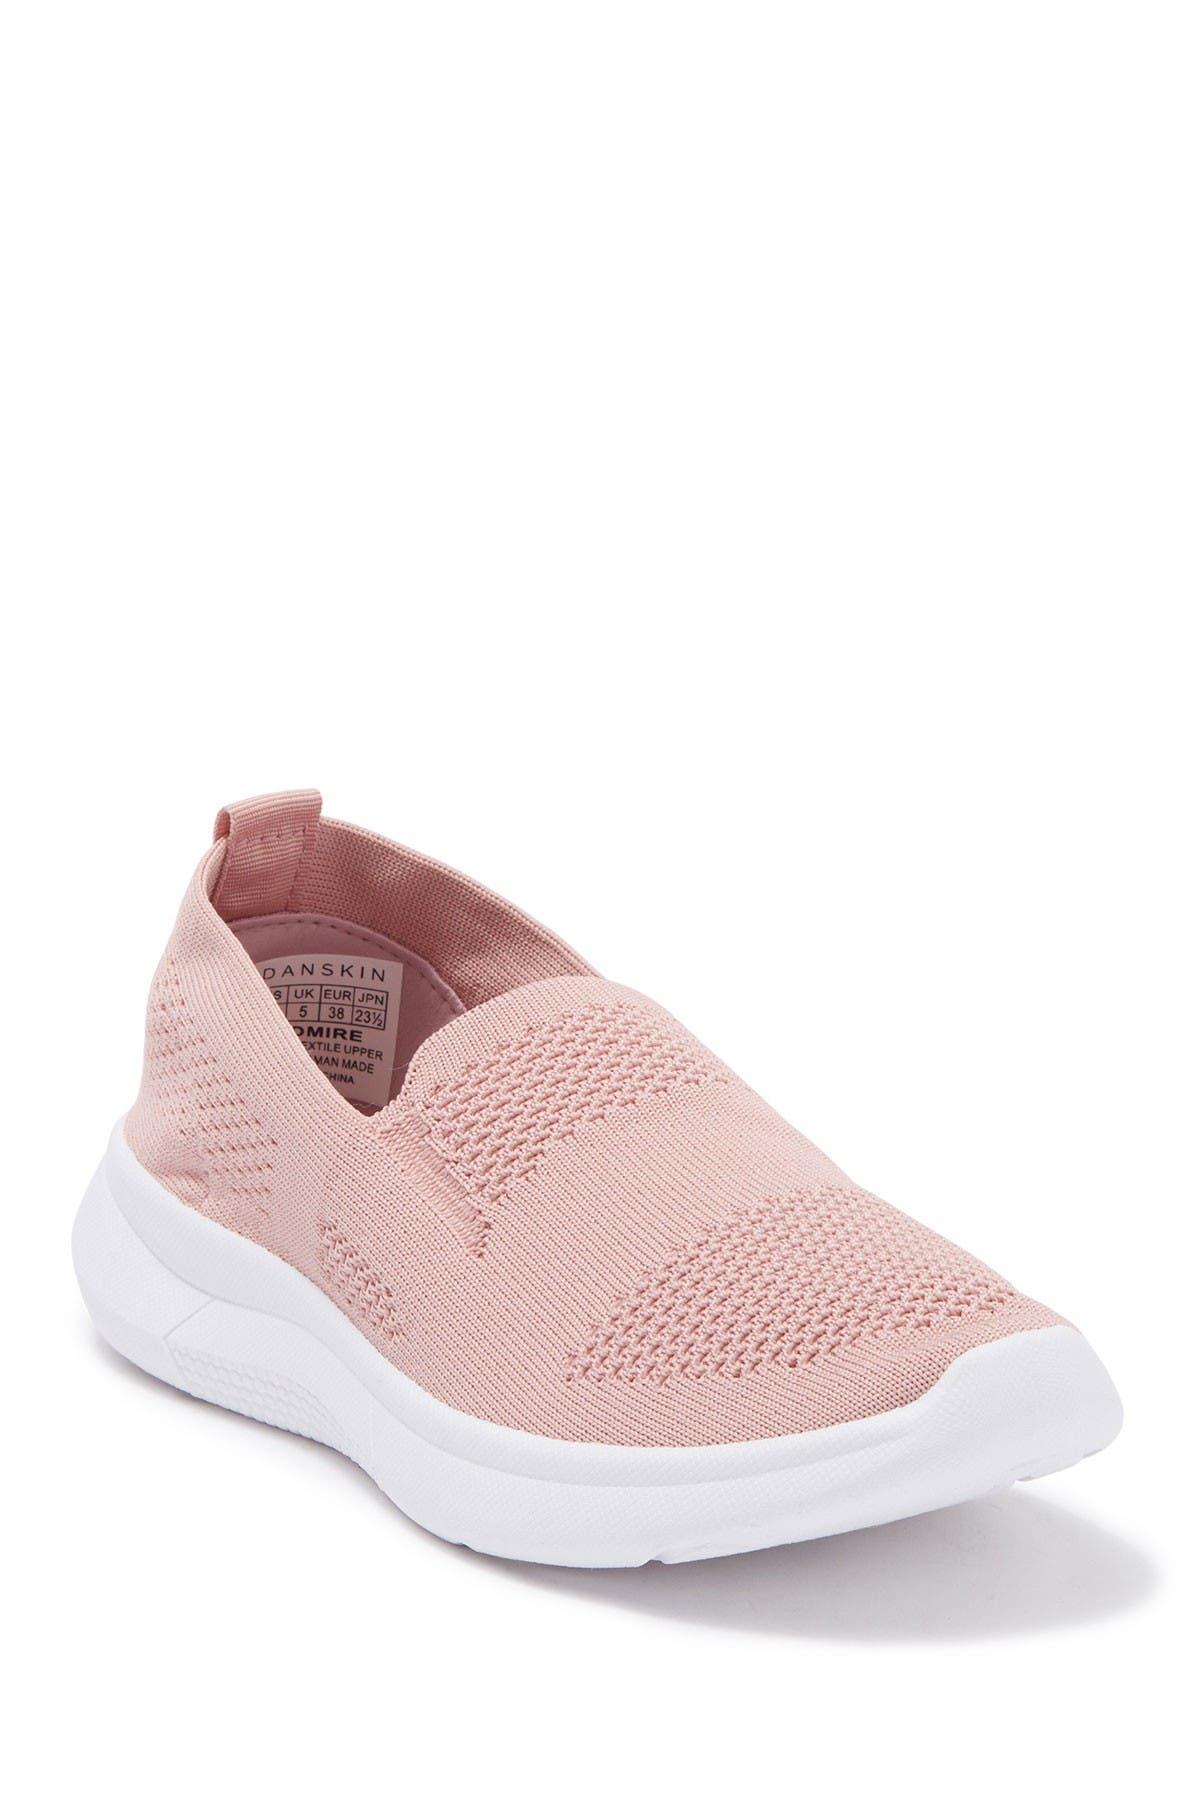 Image of DANSKIN Sock Knit Slip-On Sneaker